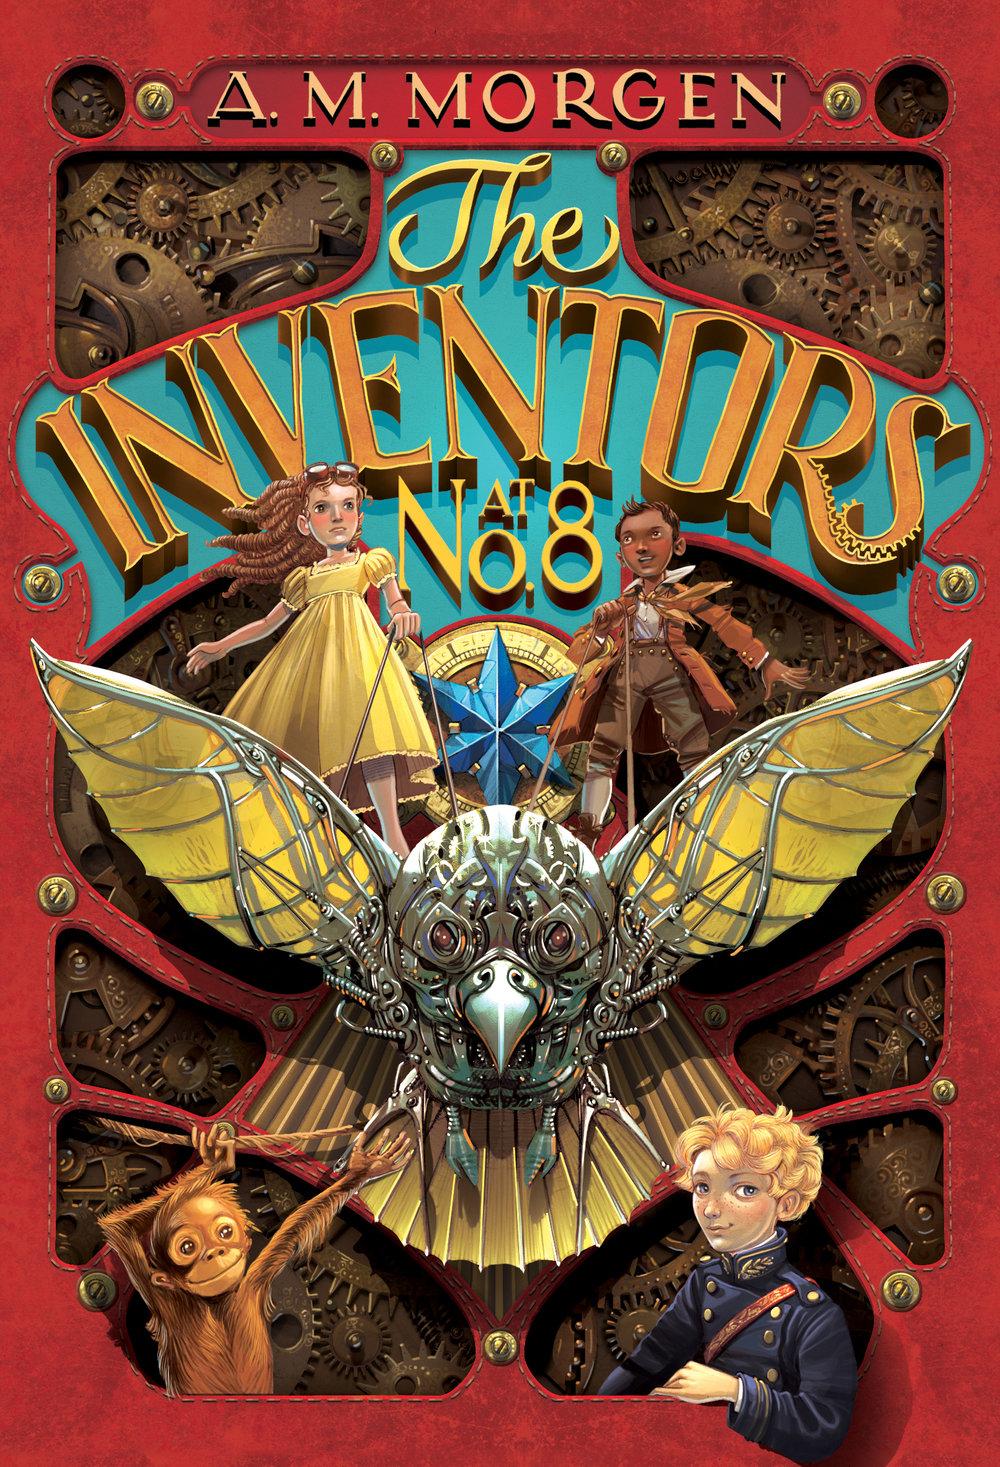 INVENTORS final cover.jpg